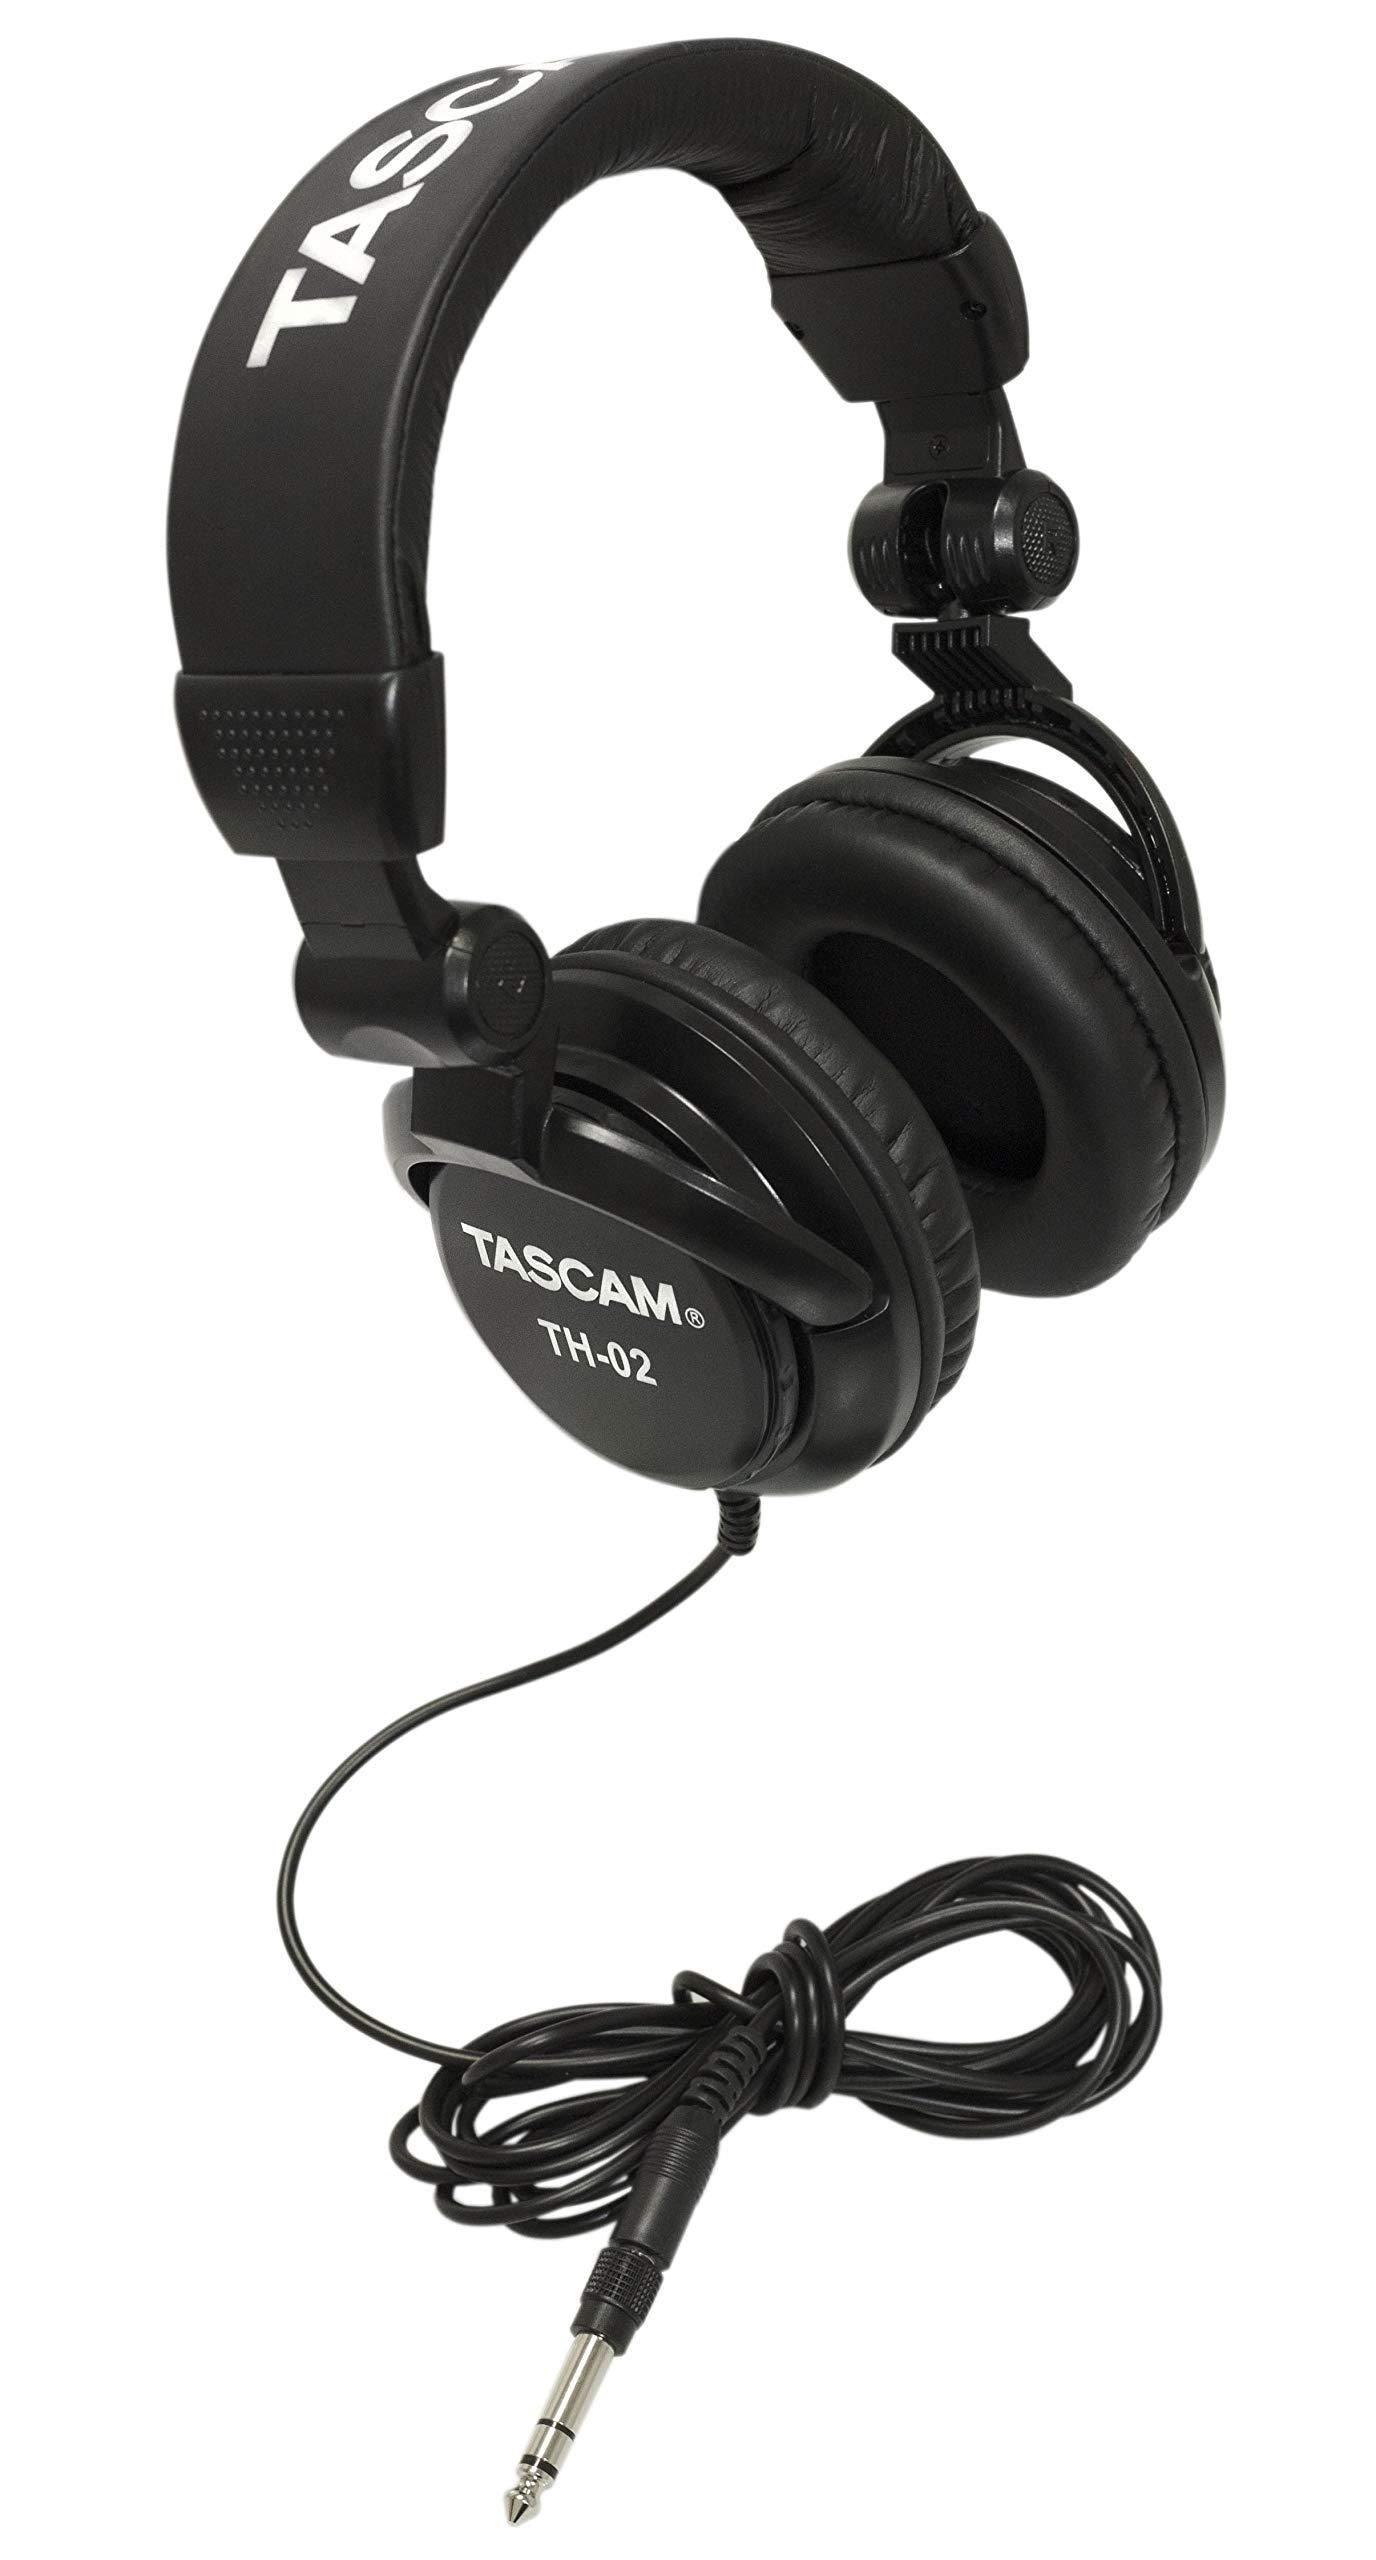 Tascam TH-02 Closed Back Studio Headphones, Black by Tascam